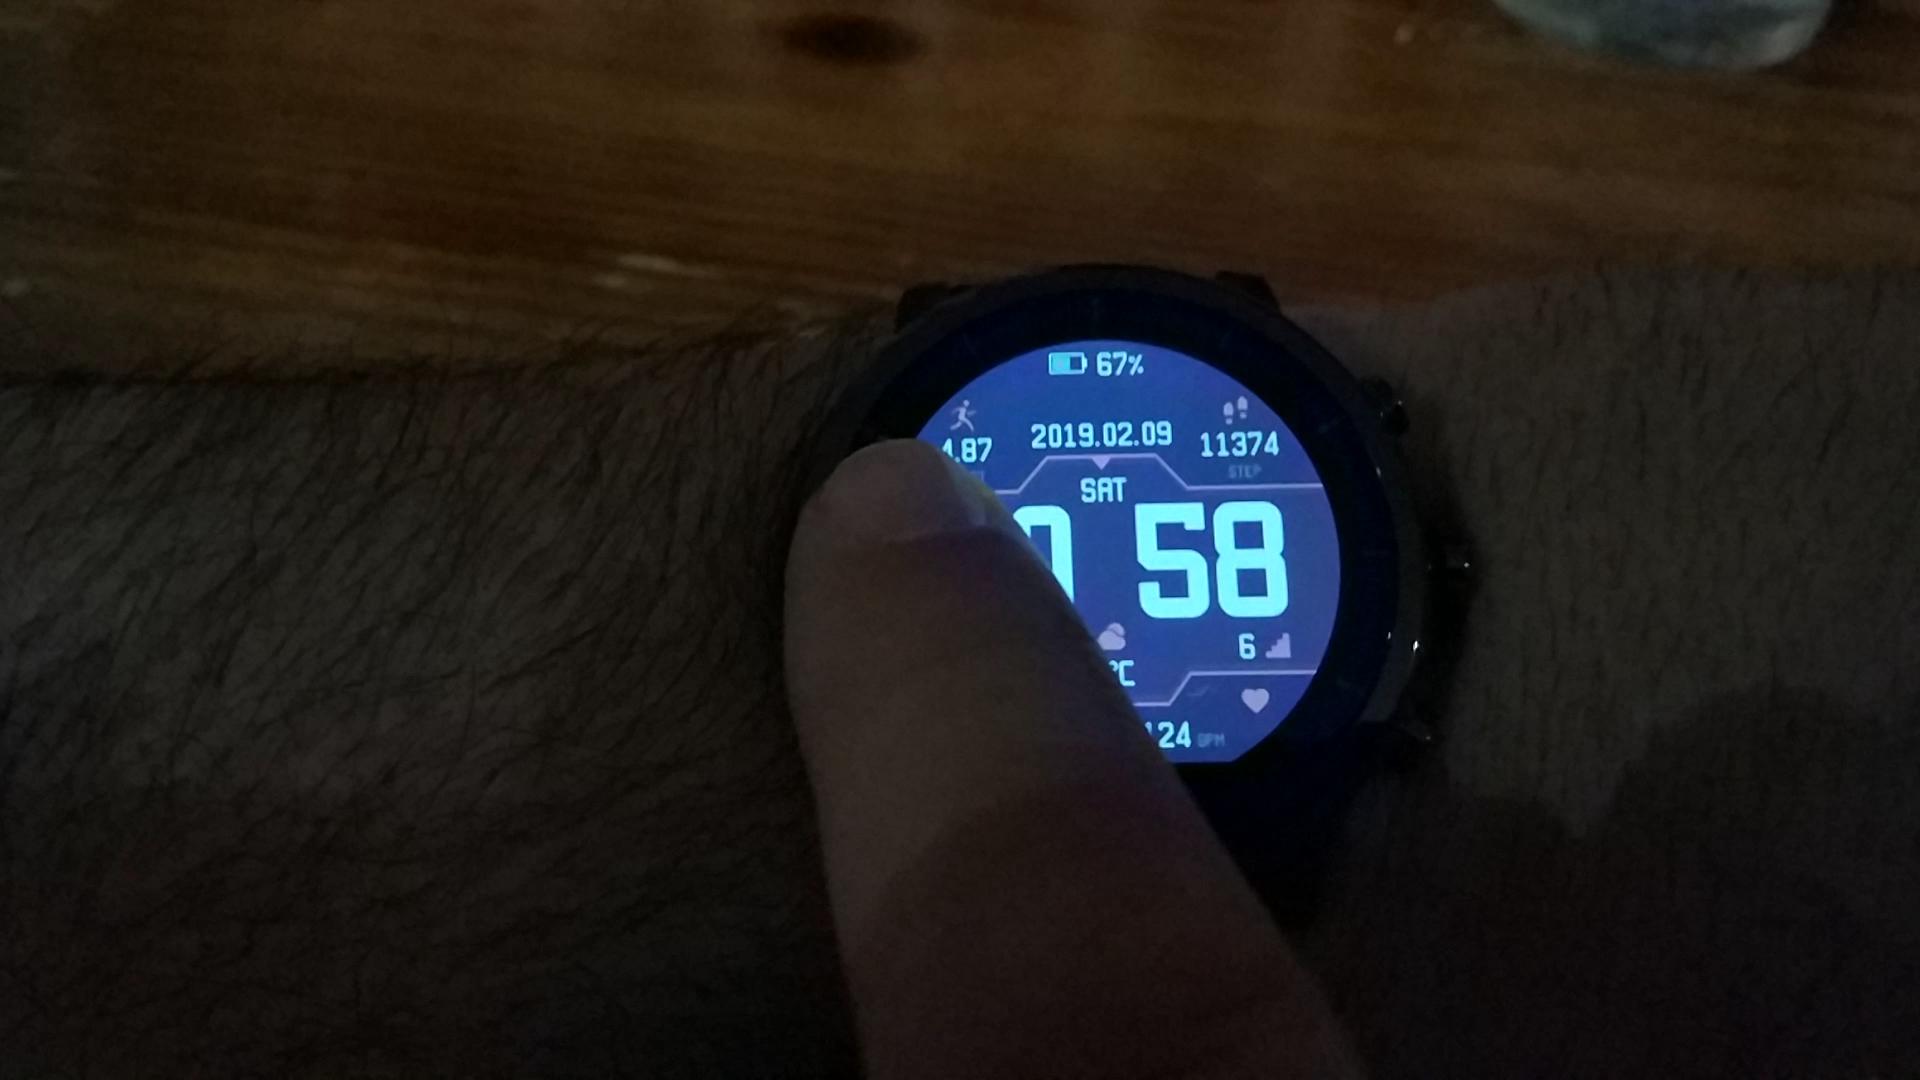 Xiaomi Amazfit Stratos 2 Smartwatch Reloj Inteligente Deportivo con GPS Bluetooth Pantalla Táctil Monitor de Ritmo Cardíaco 5ATM Impermeable Versión ...